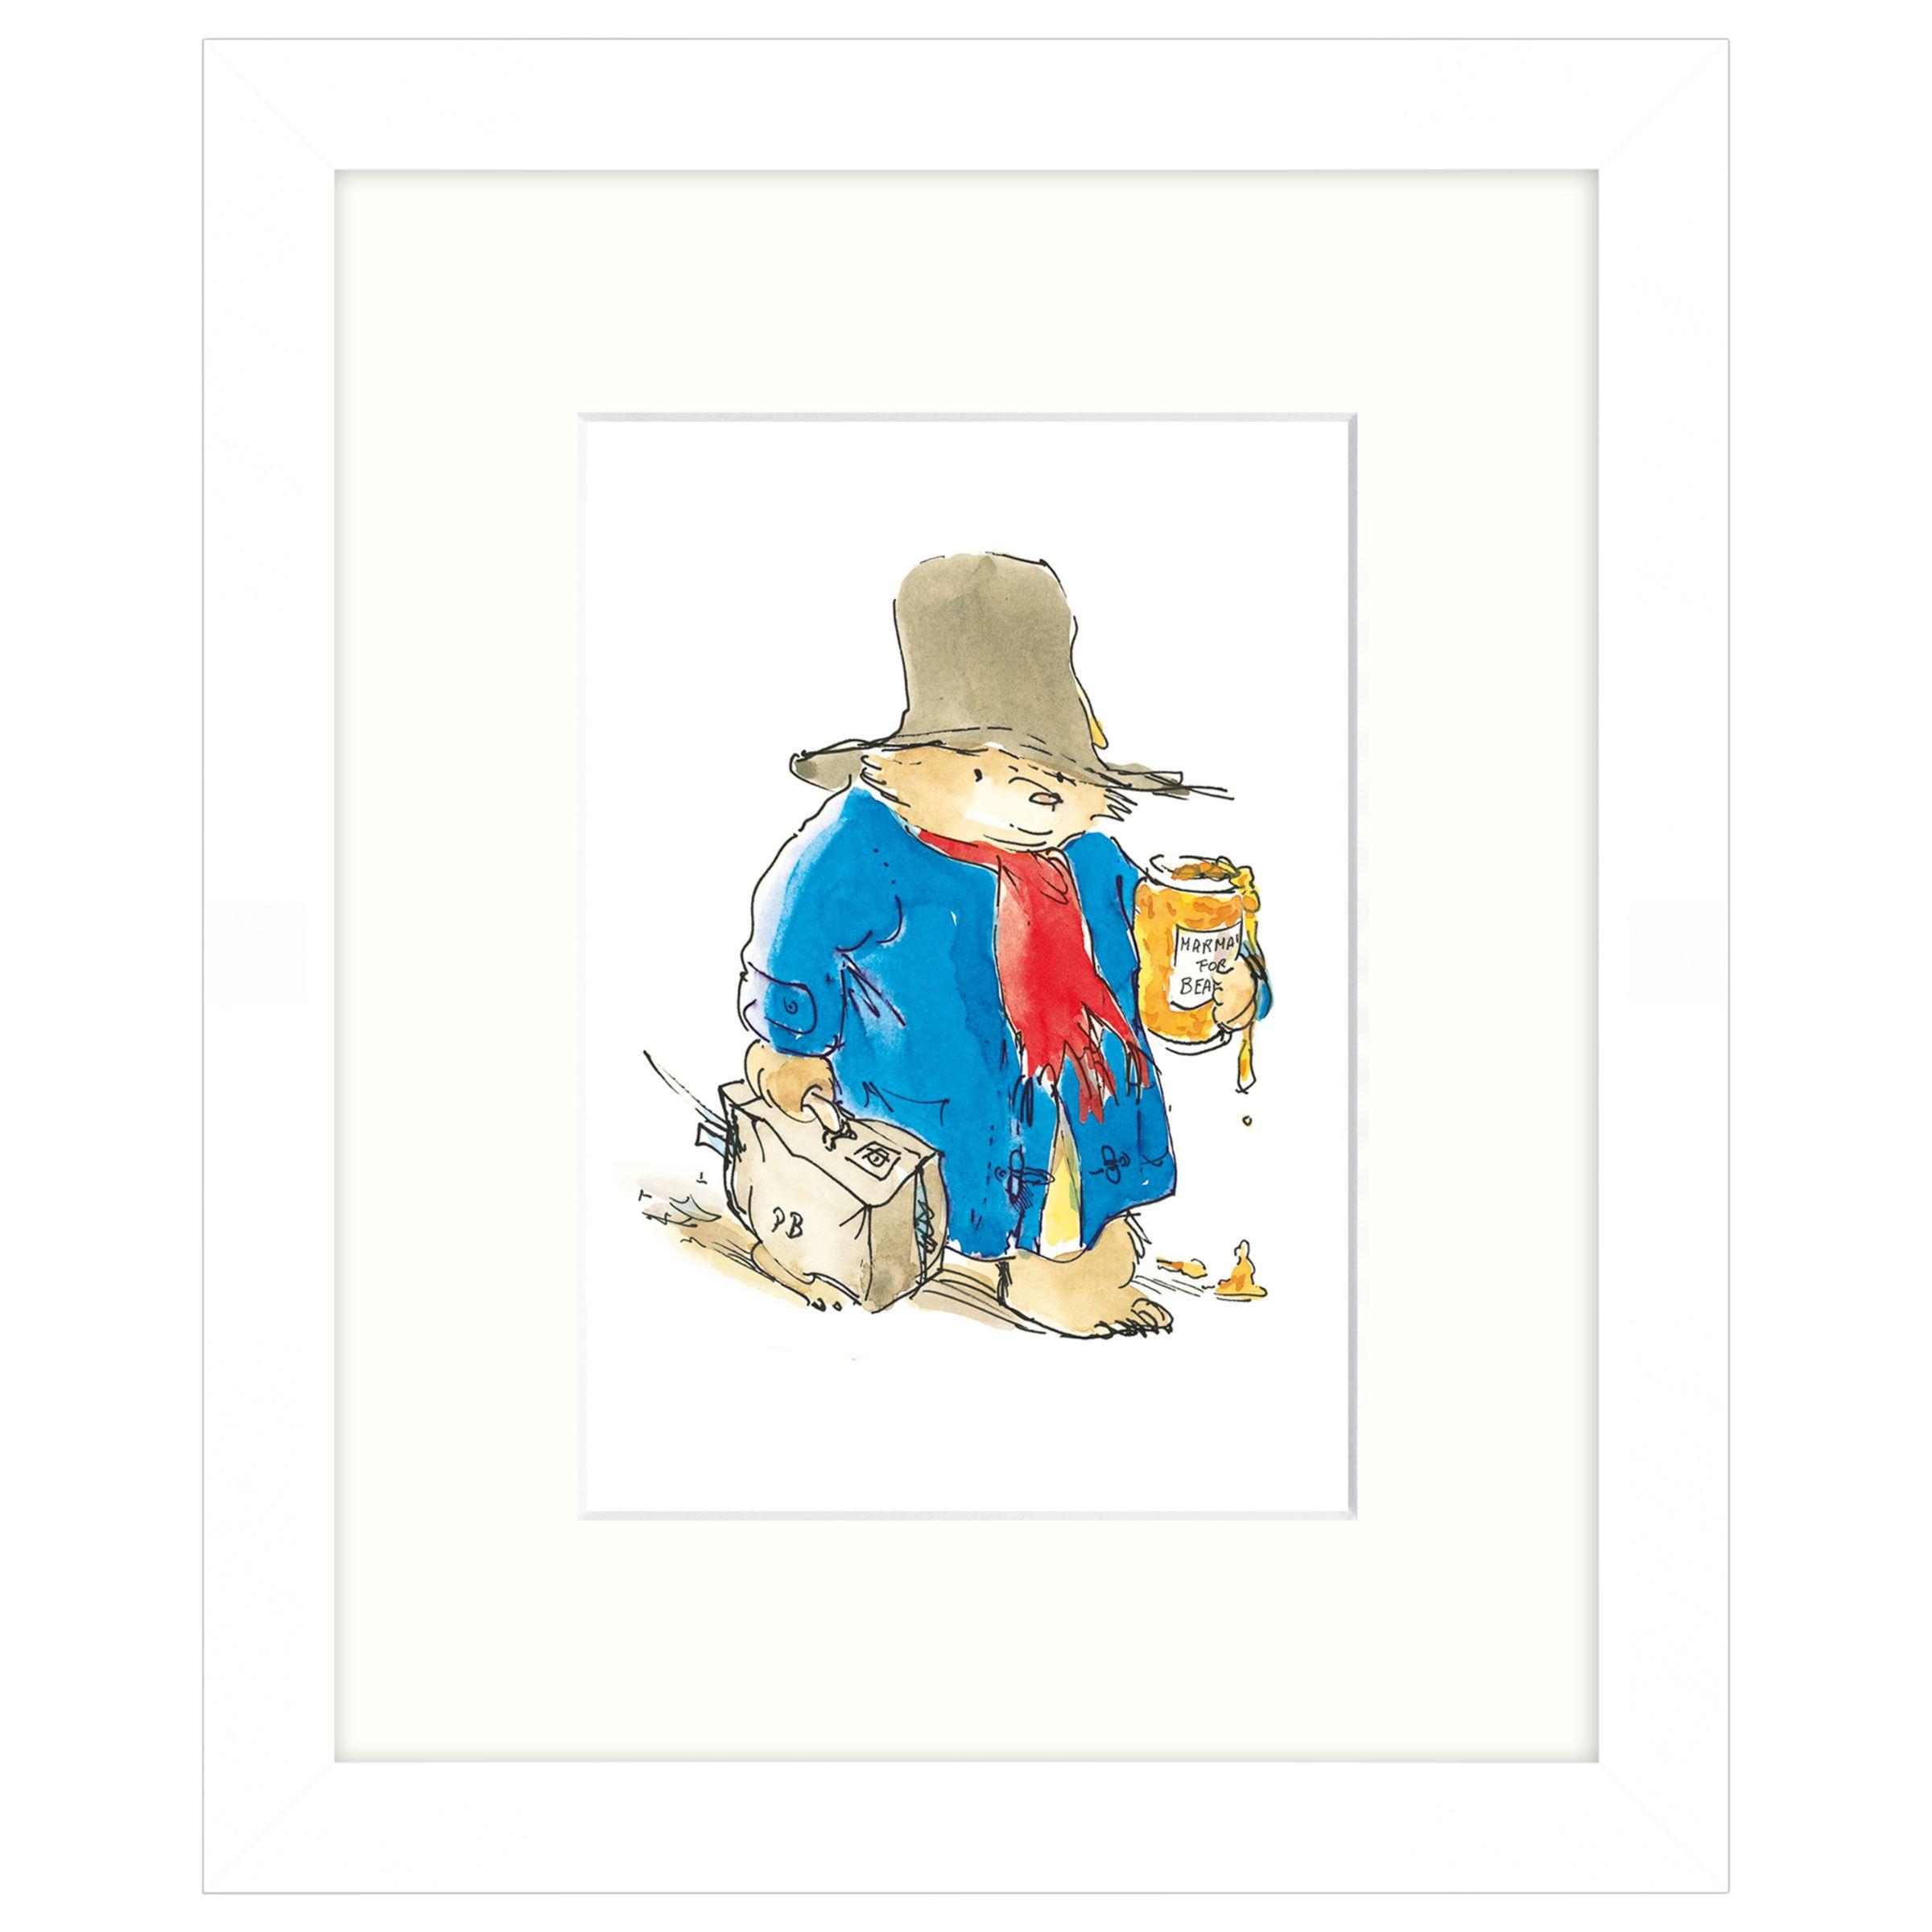 John Lewis Peggy Fortnum - Paddington with Marmalade Framed Print, 24 x 30cm